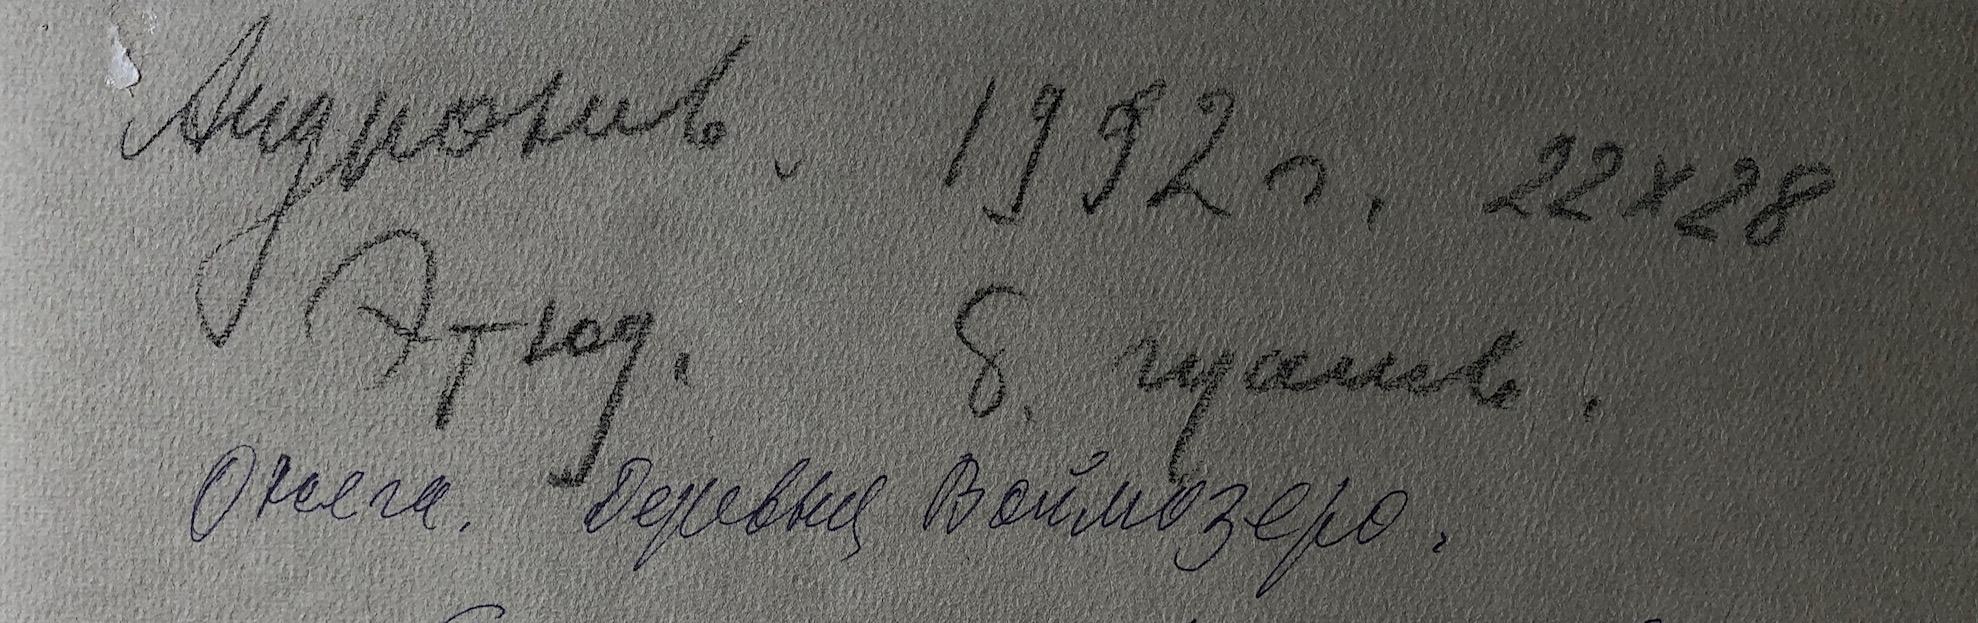 Оборот. Андронов Николай Иванович. Онега. Деревня Воймозер